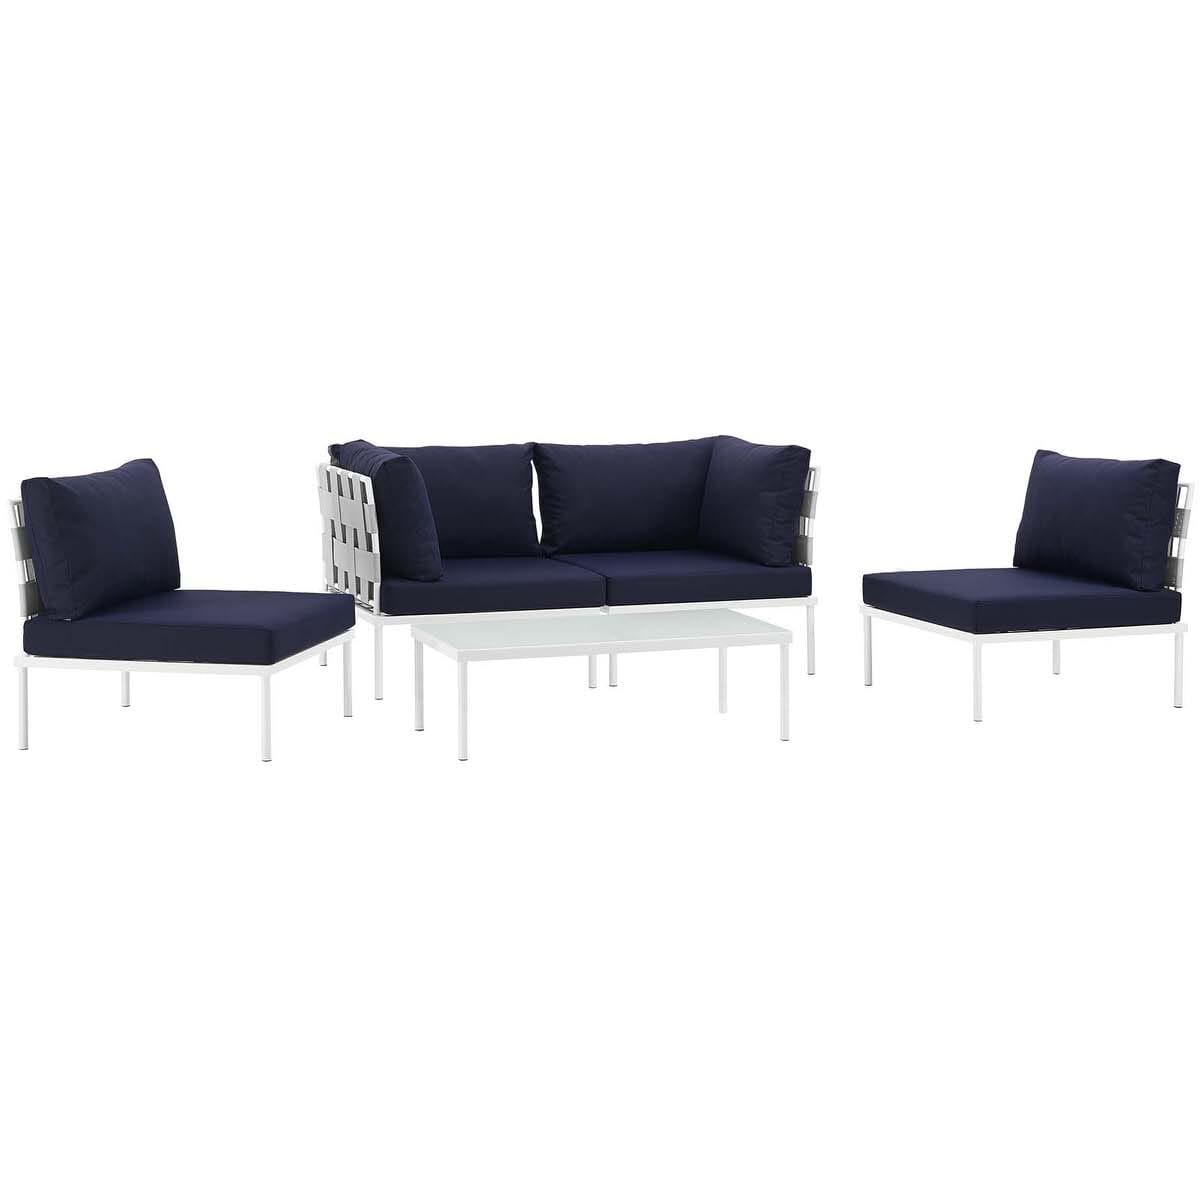 Harmony 5 Piece Outdoor Patio Aluminum Sectional Sofa Set White Navy ...